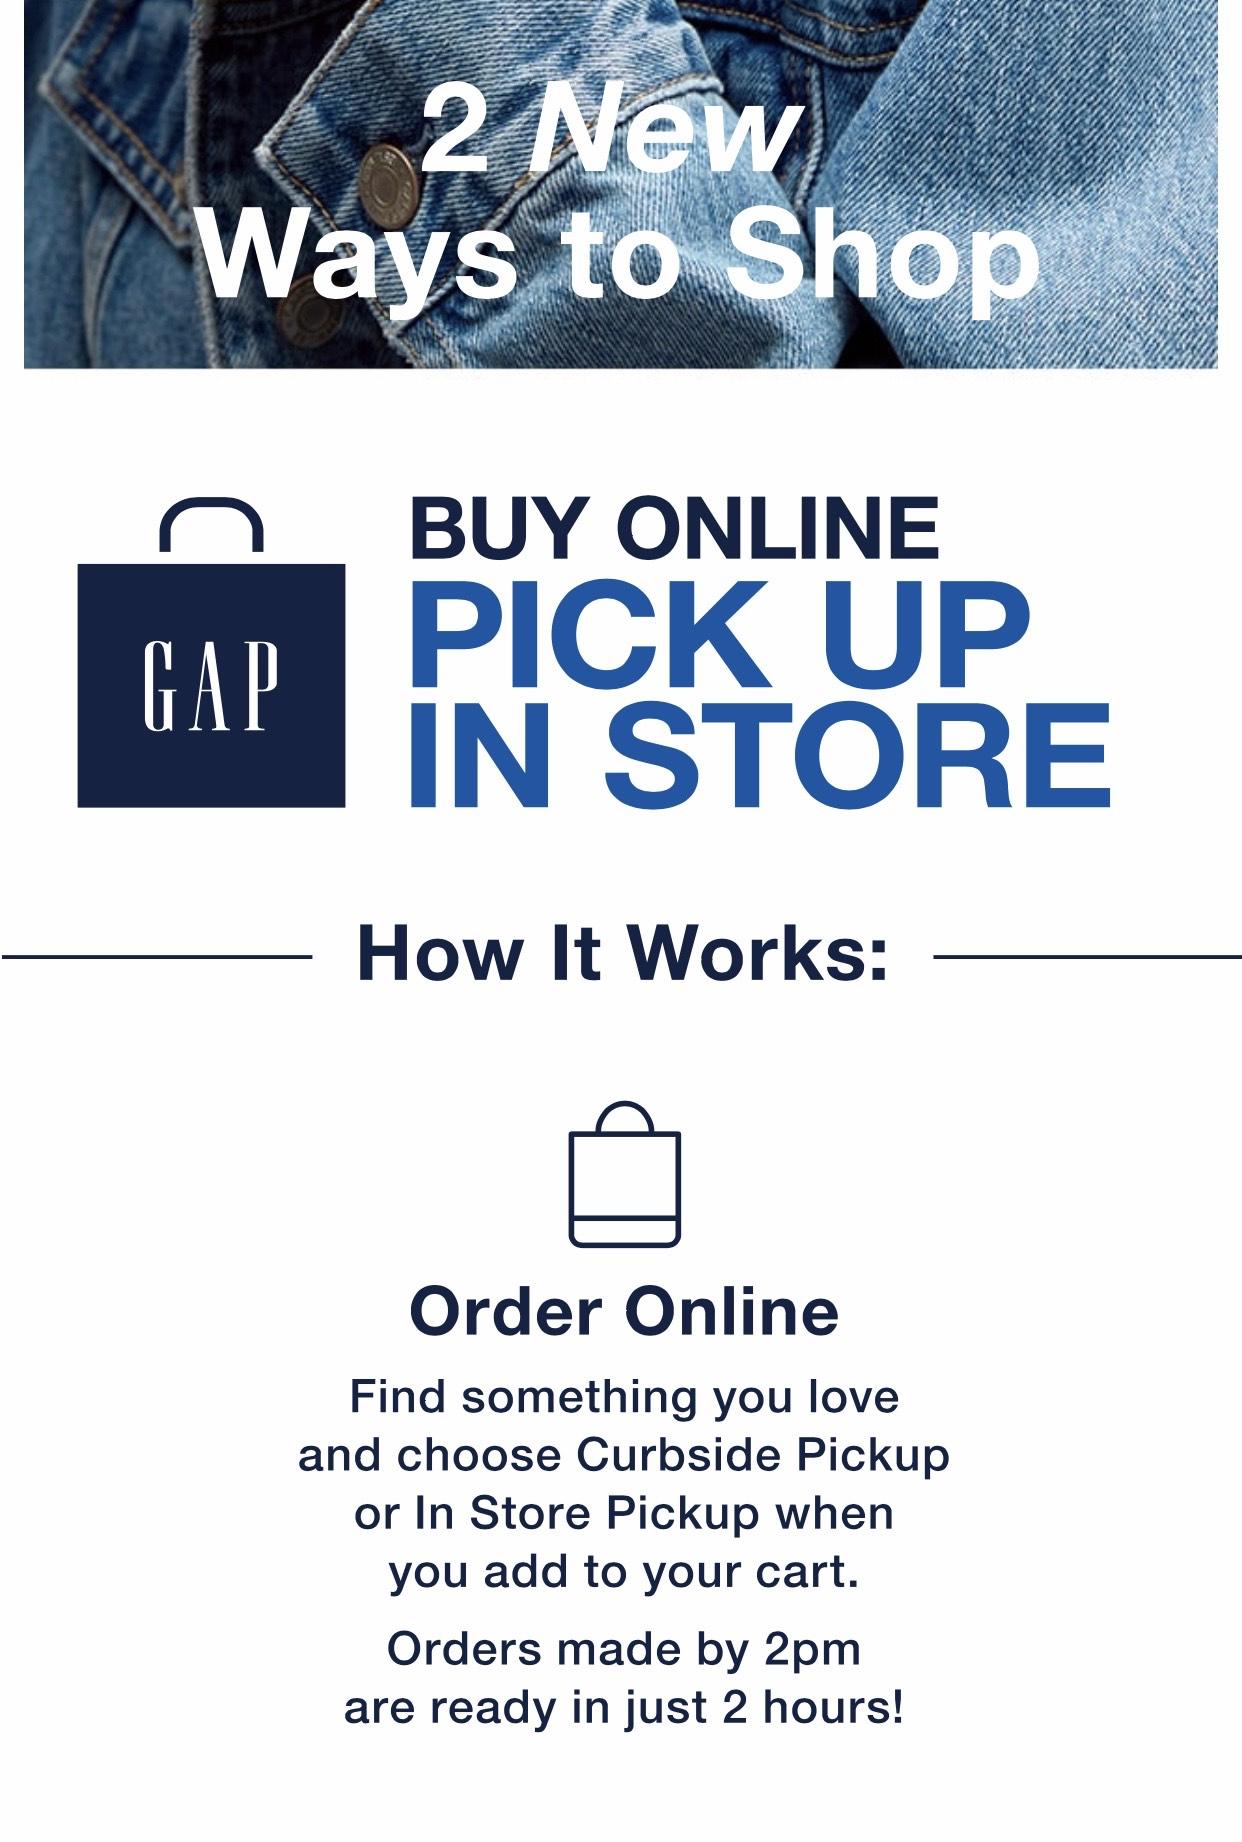 Shop Online & Pick Up